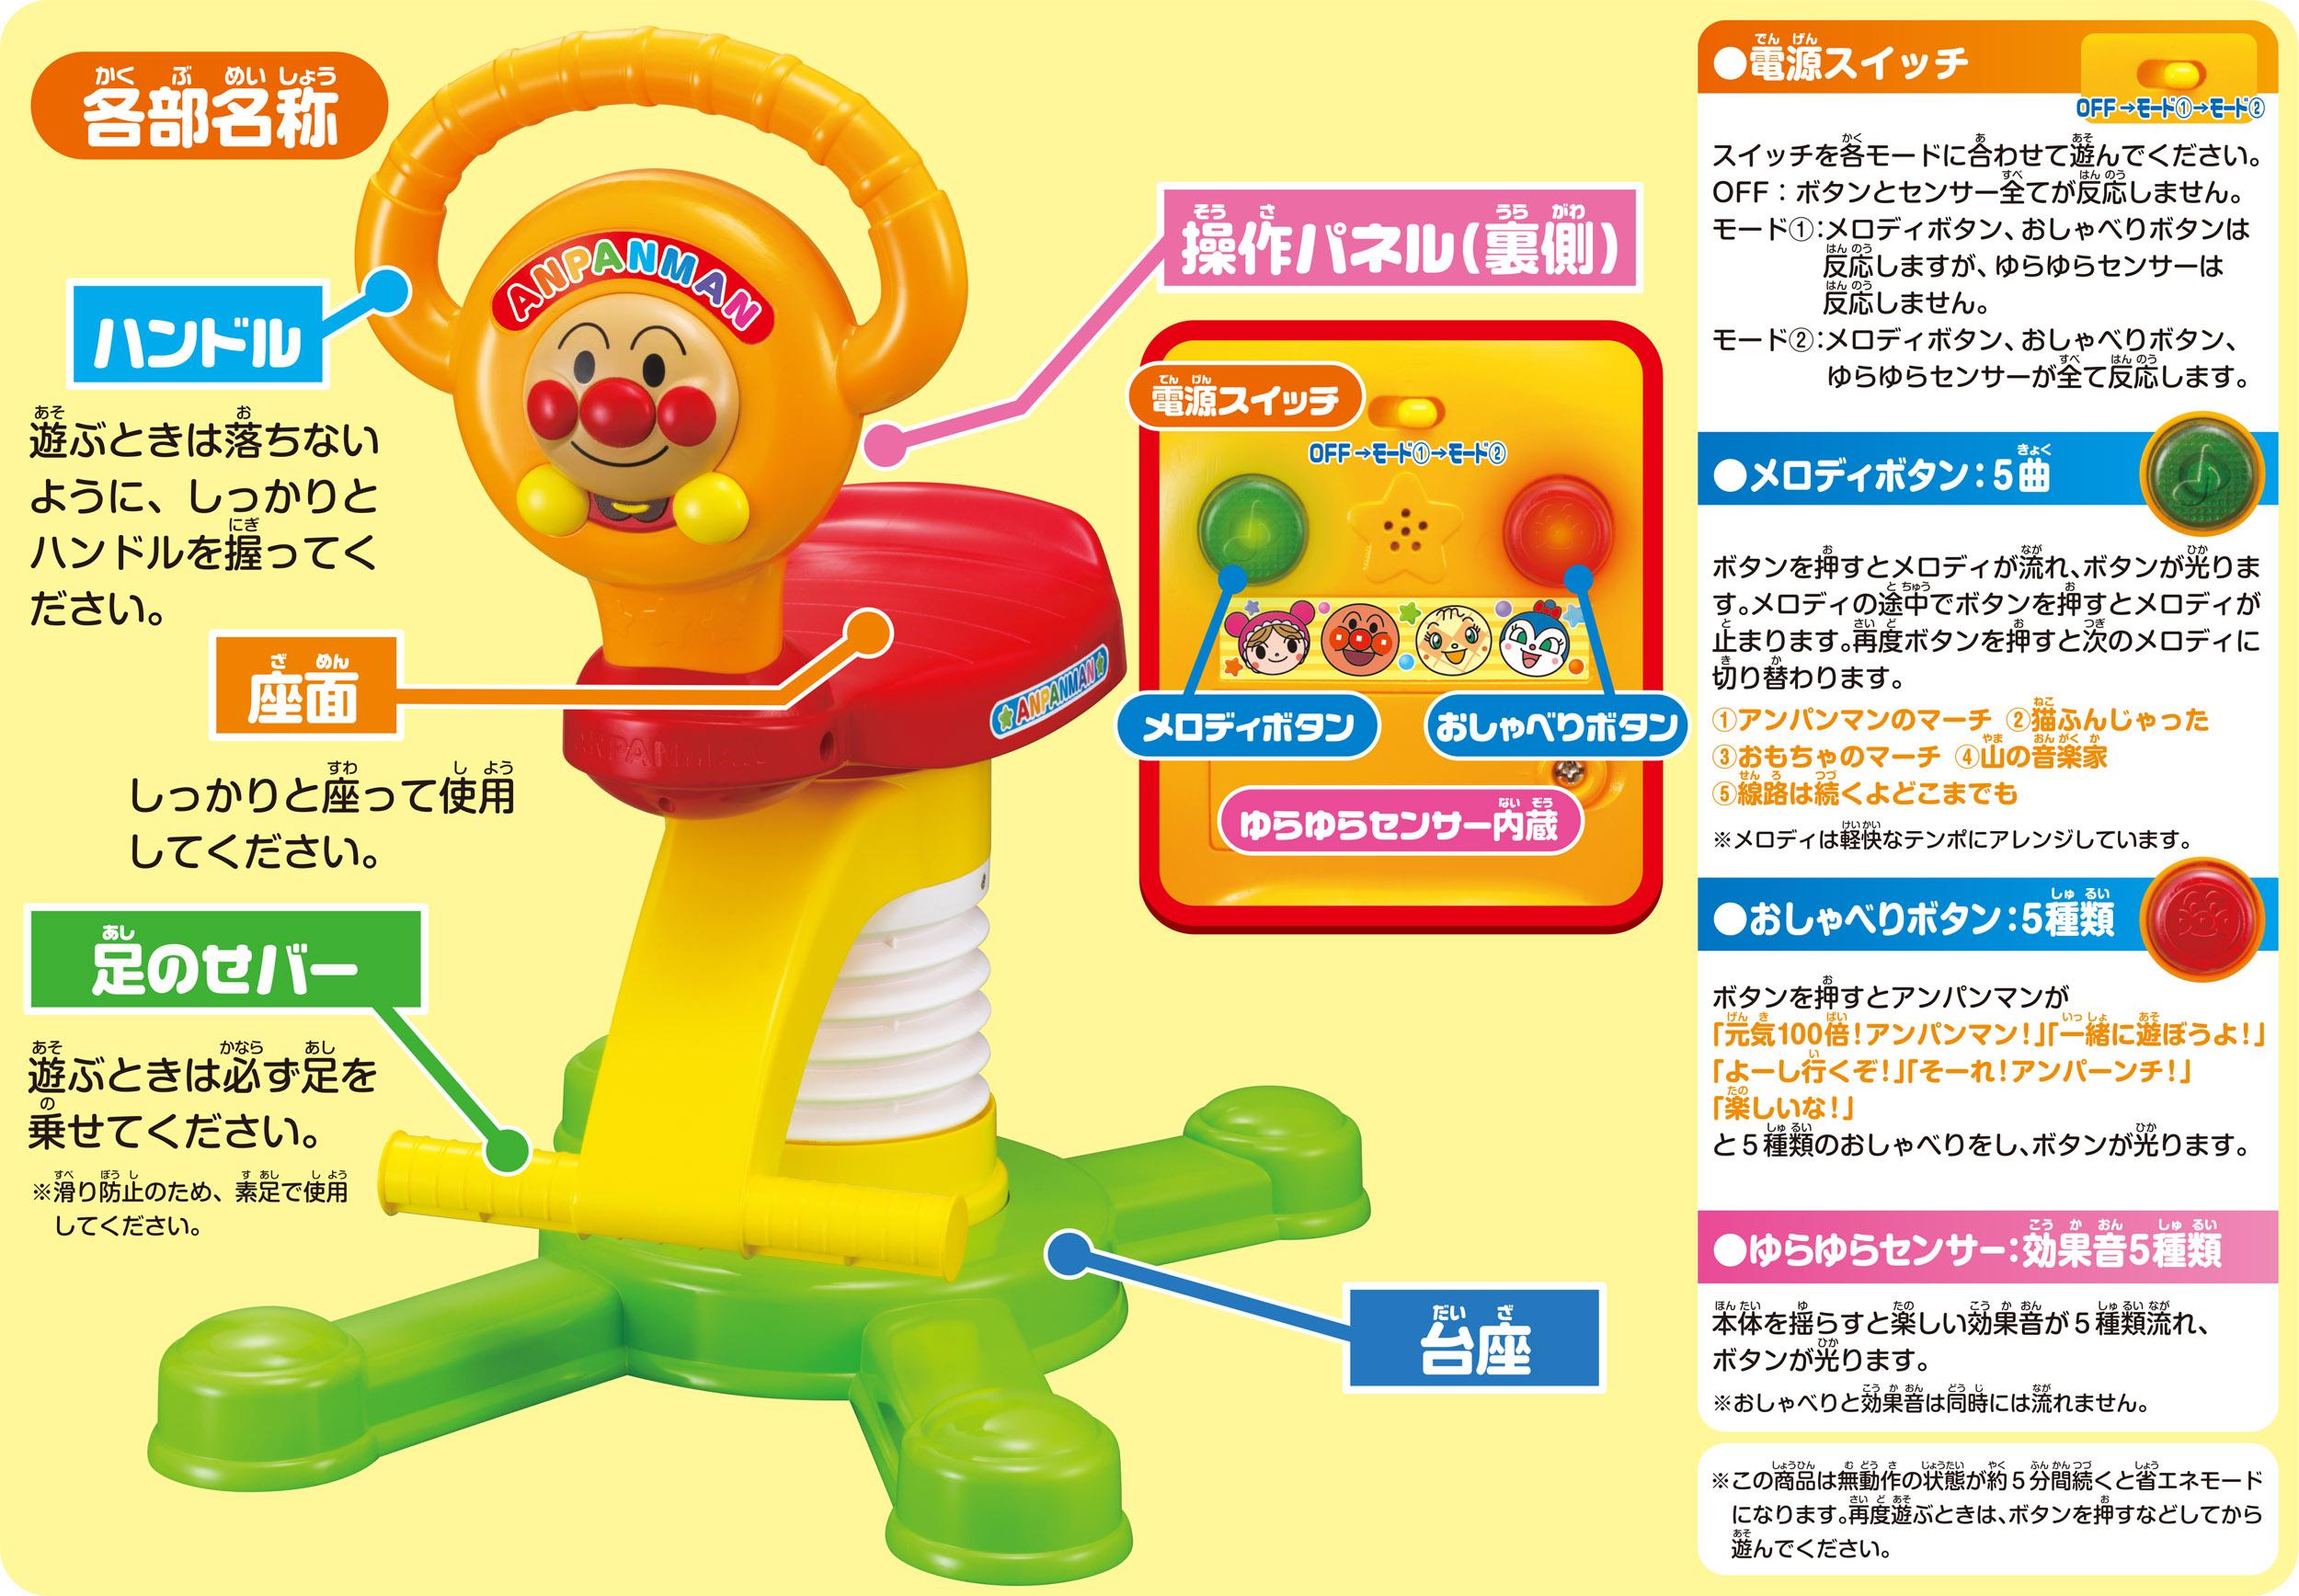 http://www.agatsuma.co.jp/product_test/new_goods/image/anpanman/4971404314948_2_l.jpg